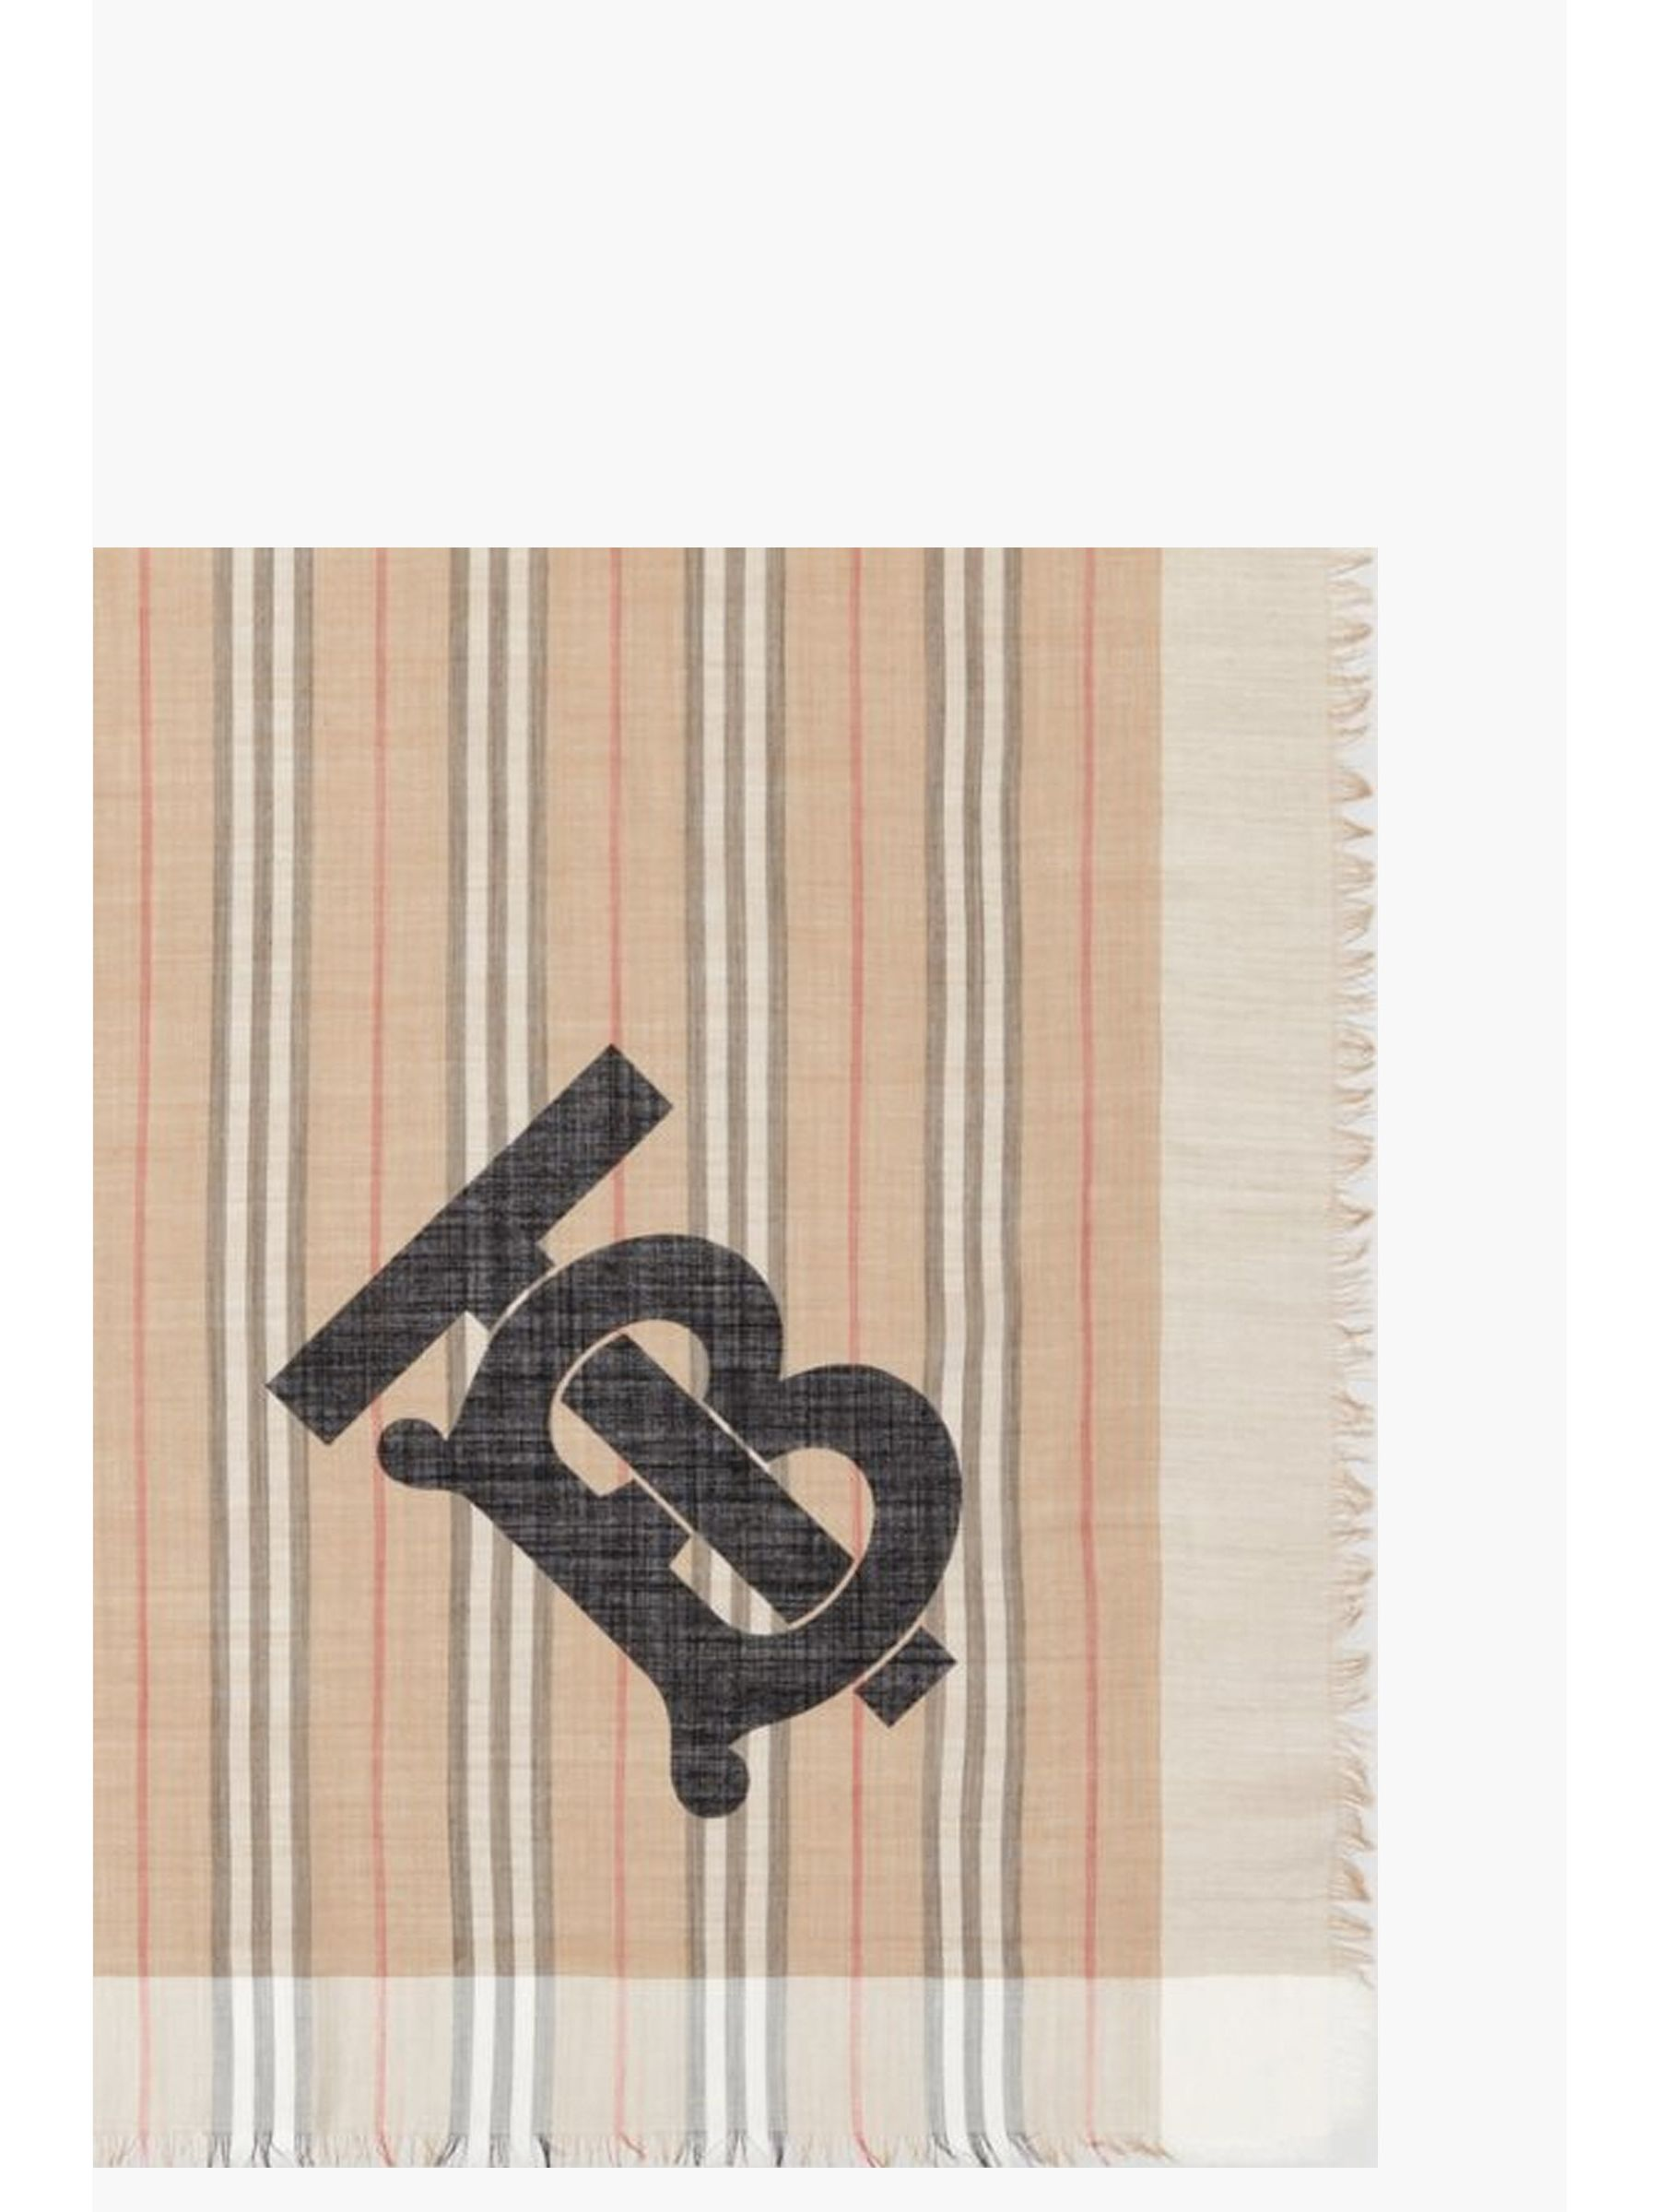 111069545b_burberry_tb_heritage_stripe_gauze_square_archieve_beige.jpg